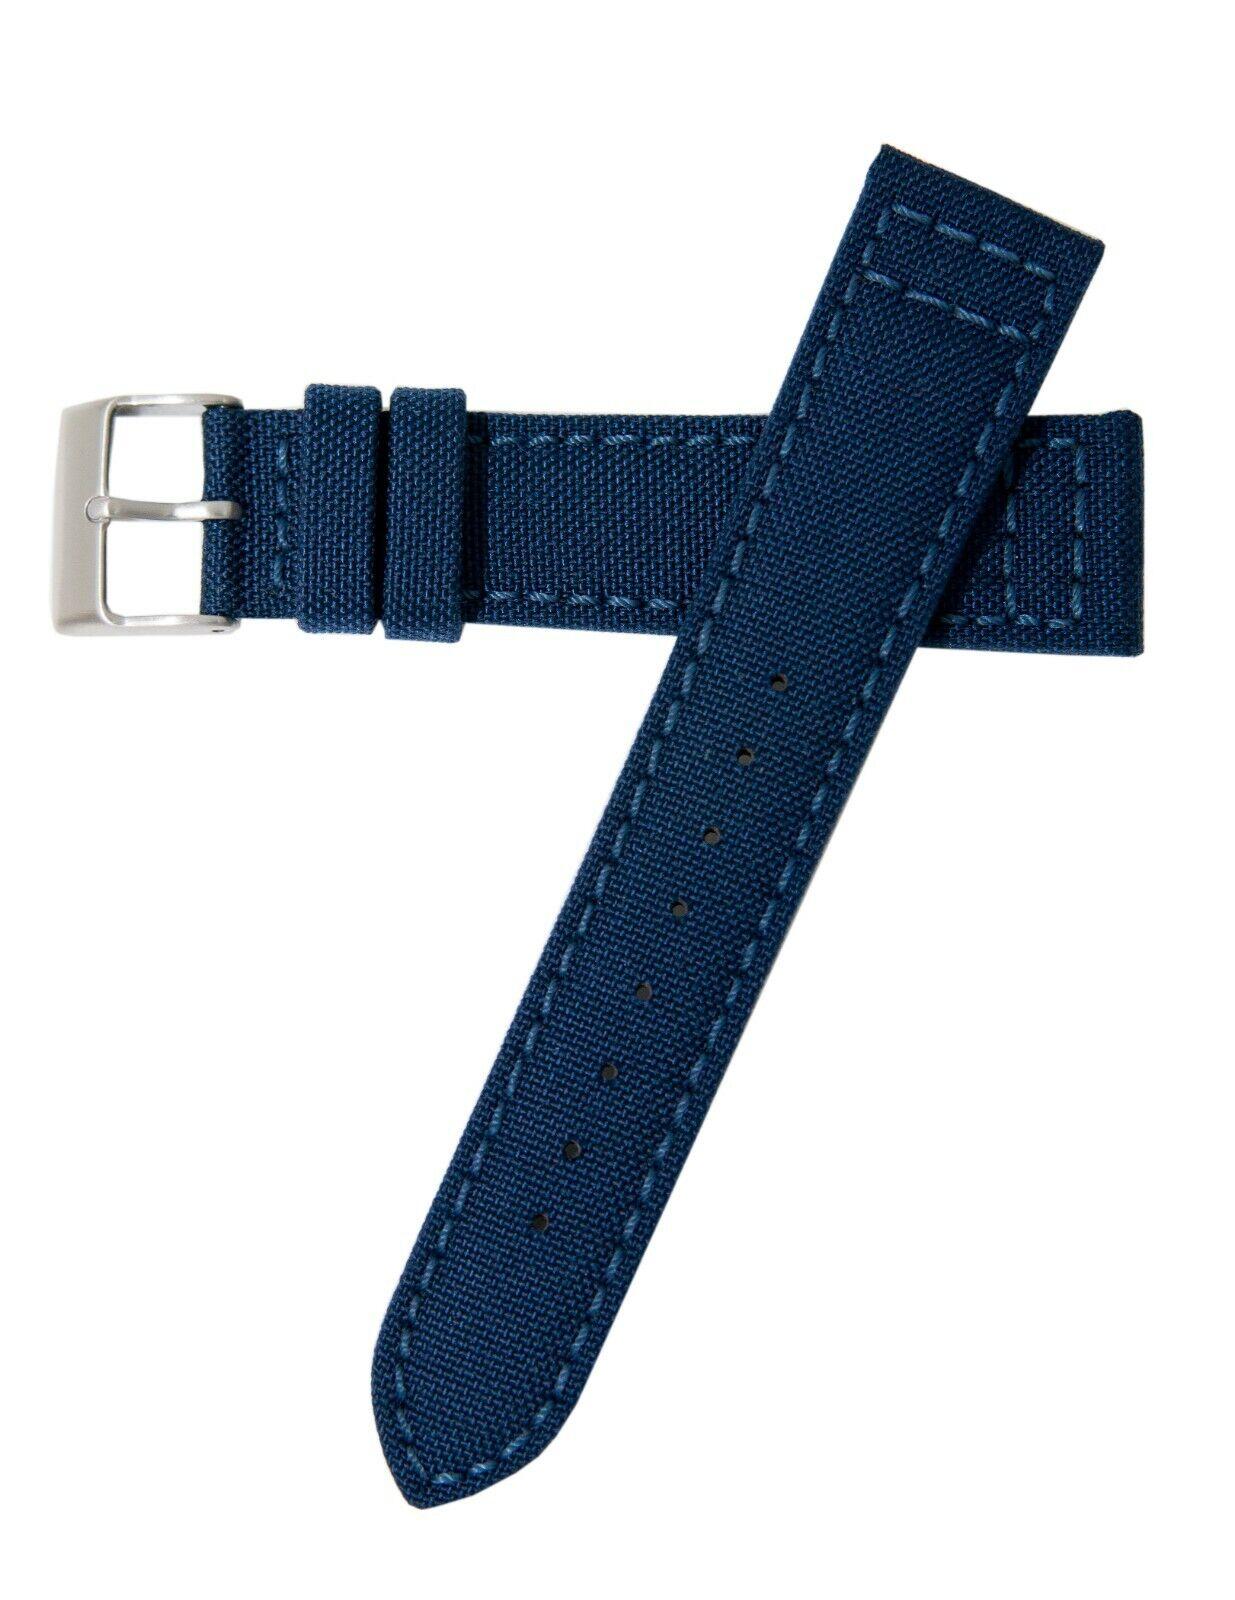 22mm Hadley-Roma MS850 Mens Navy Cordura Canvas Watch Band S